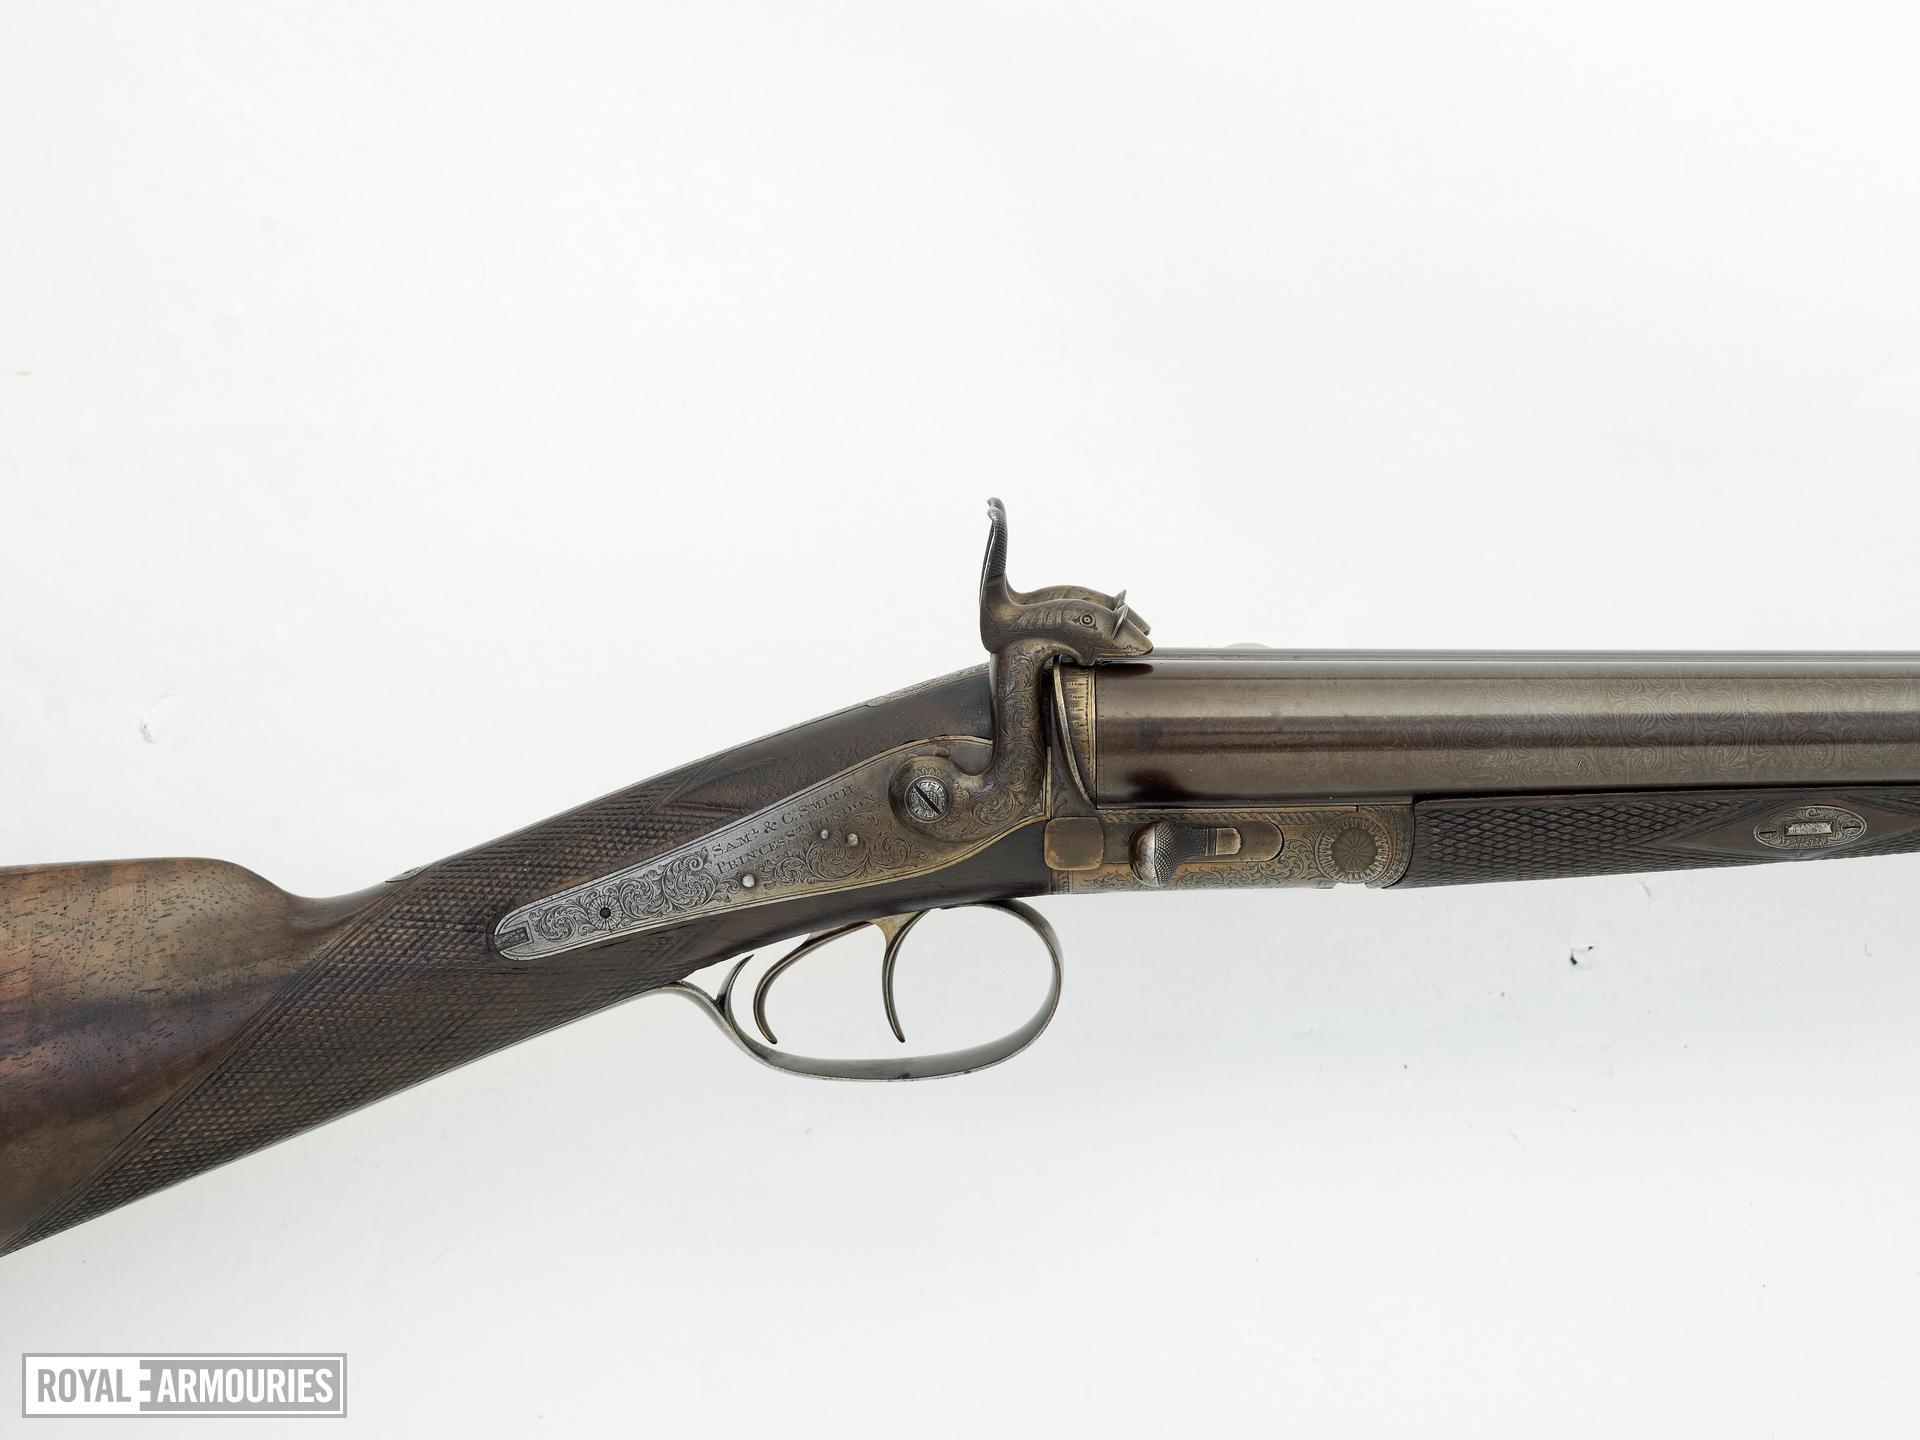 Pinfire breech-loading double-barrelled shotgun - By Samual and C. Smith Hammer gun